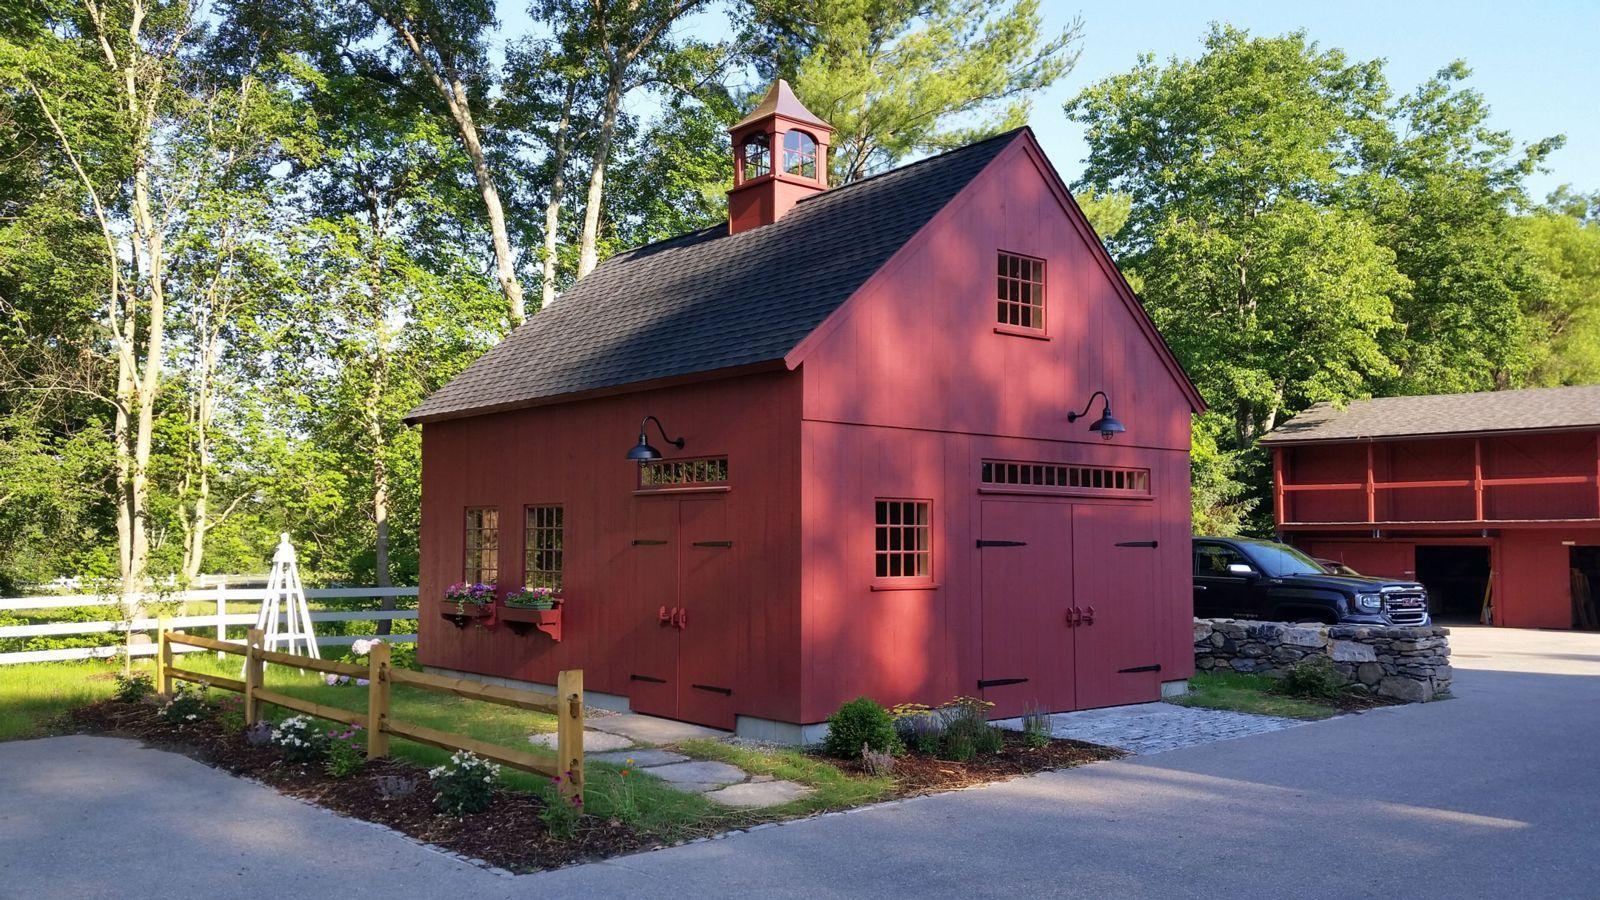 New England Style Post and Beam Barns